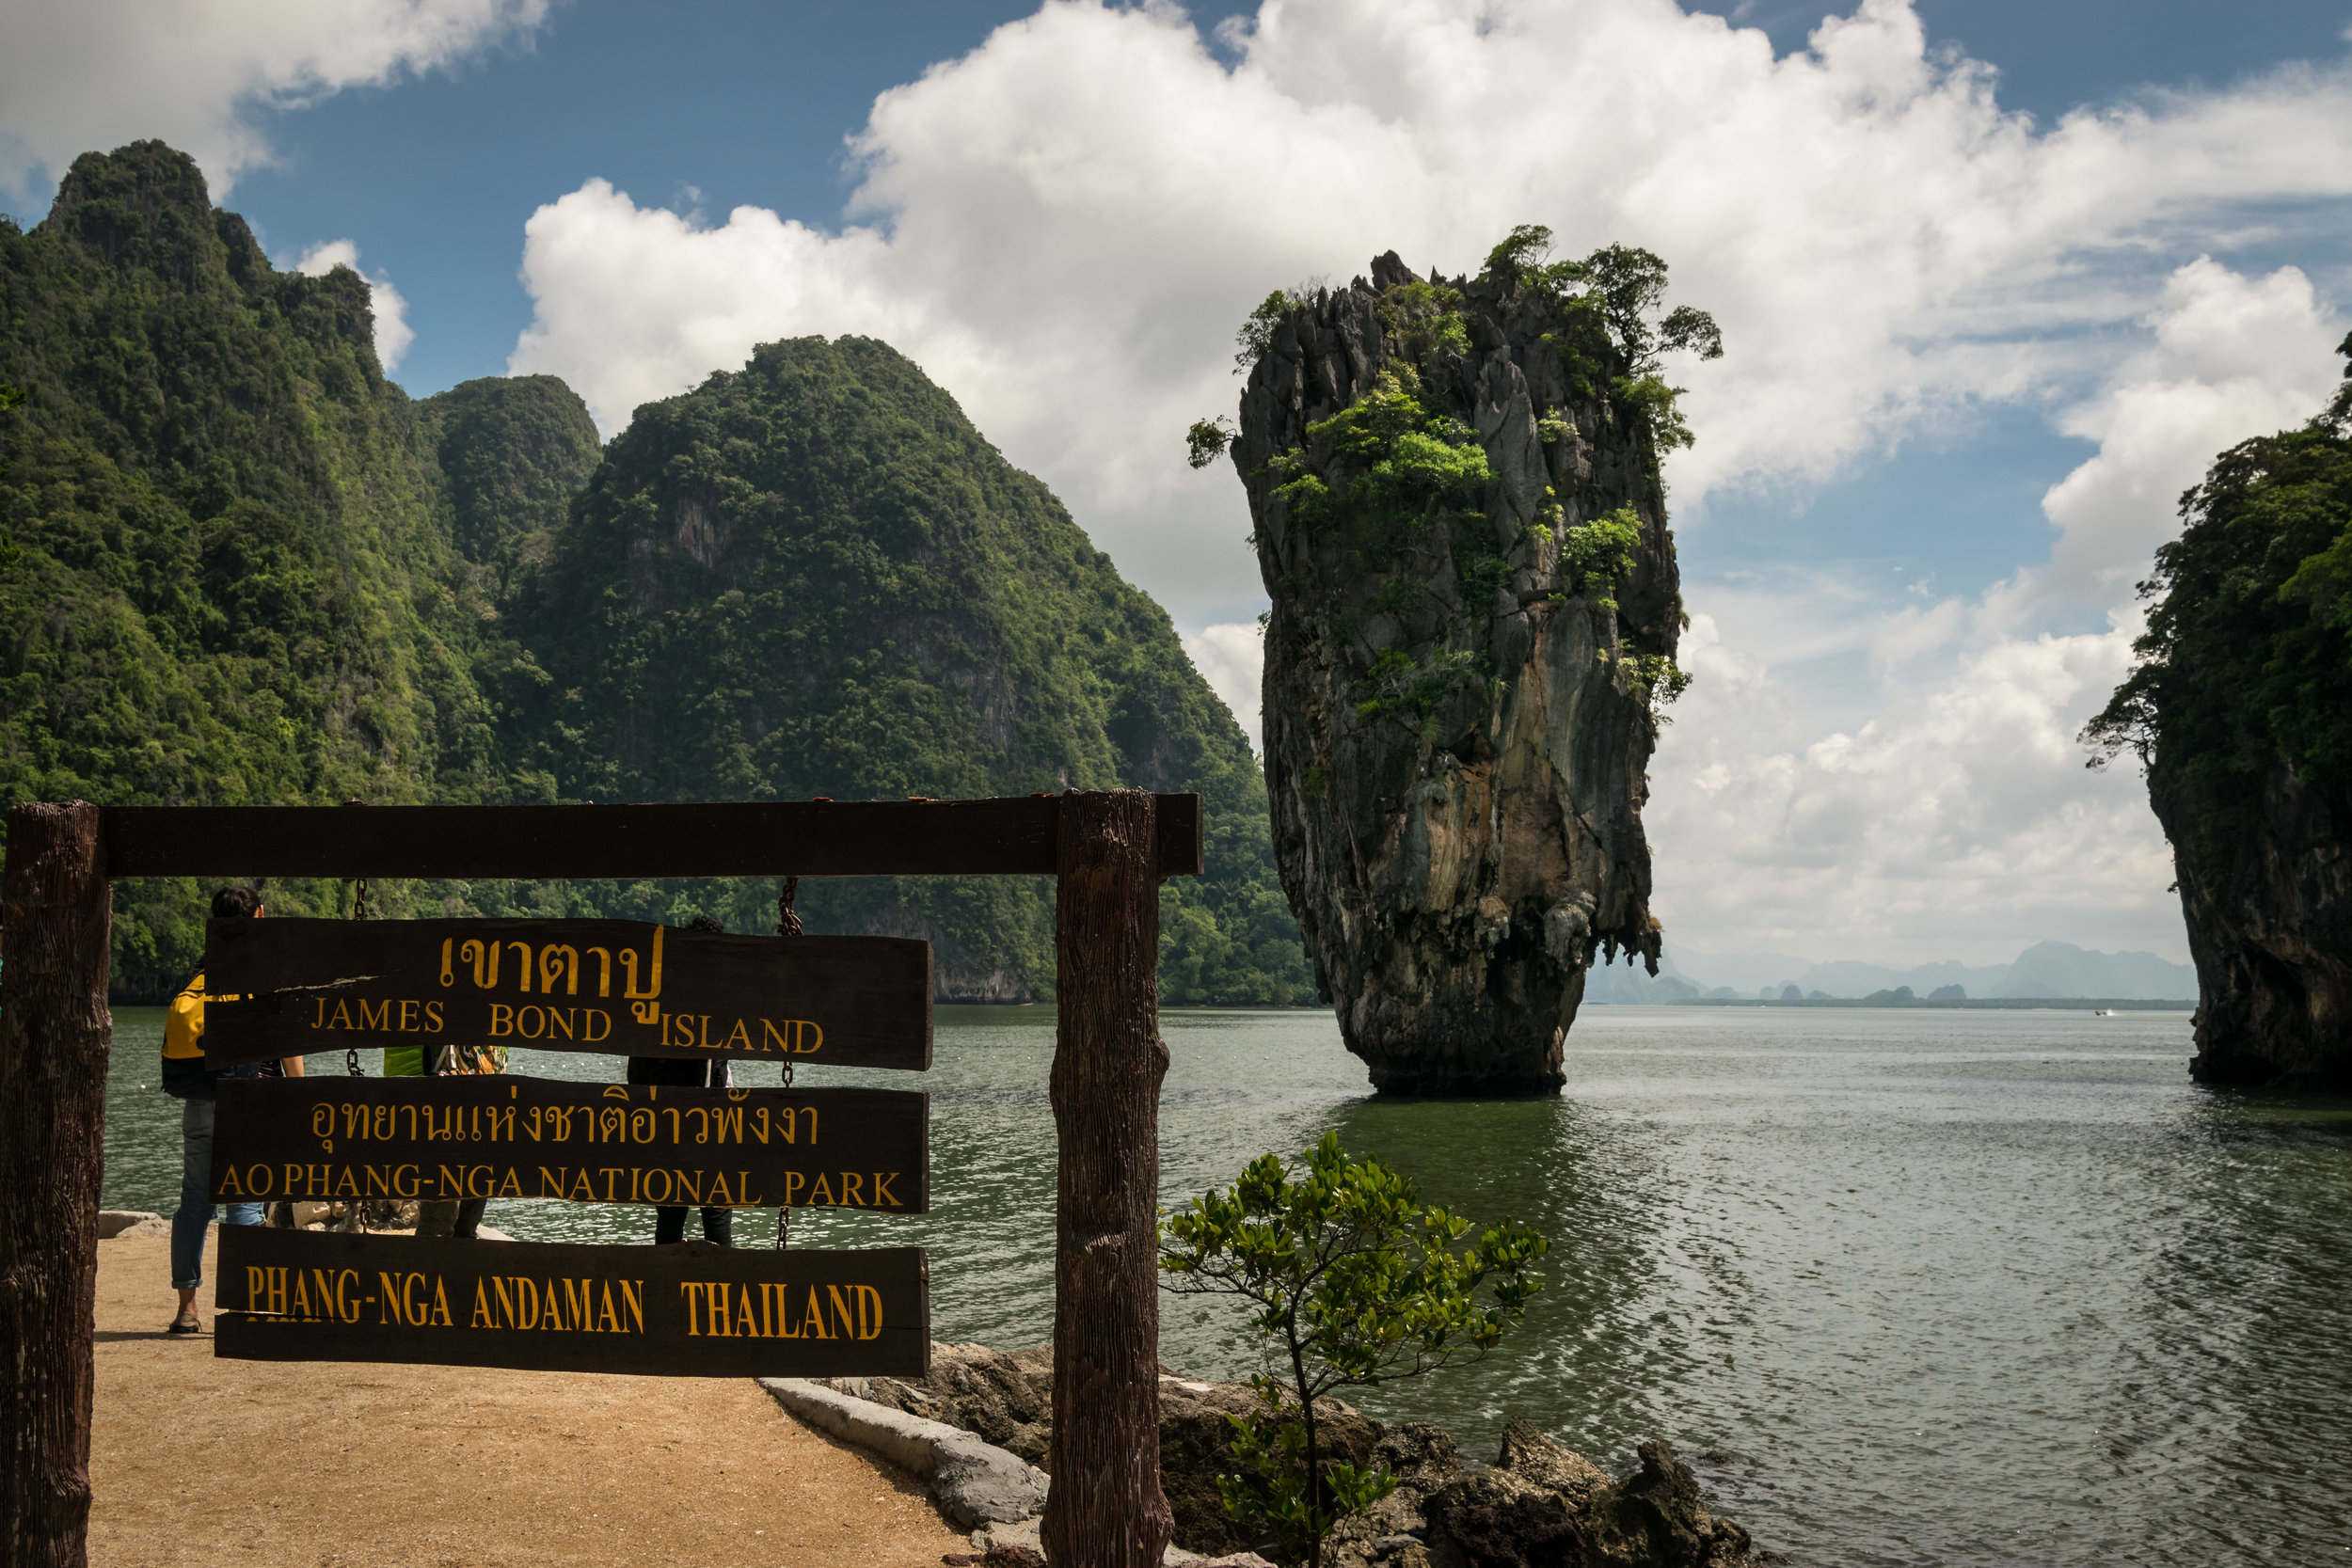 Phuket islands_James Bond Island-1.jpg